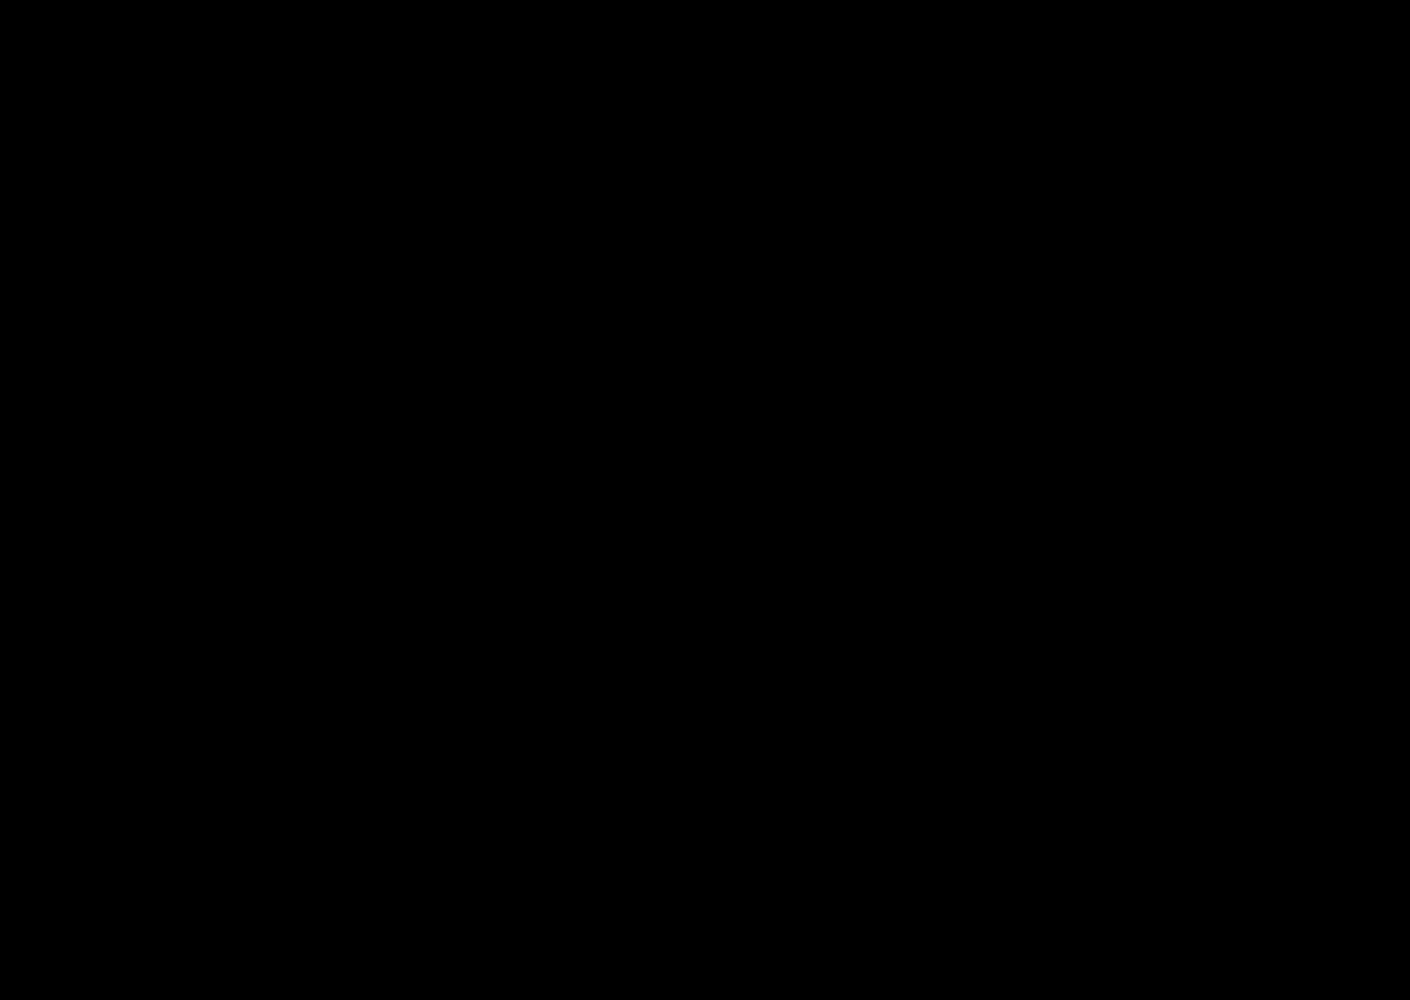 shoe-silhouette-clip-art-18